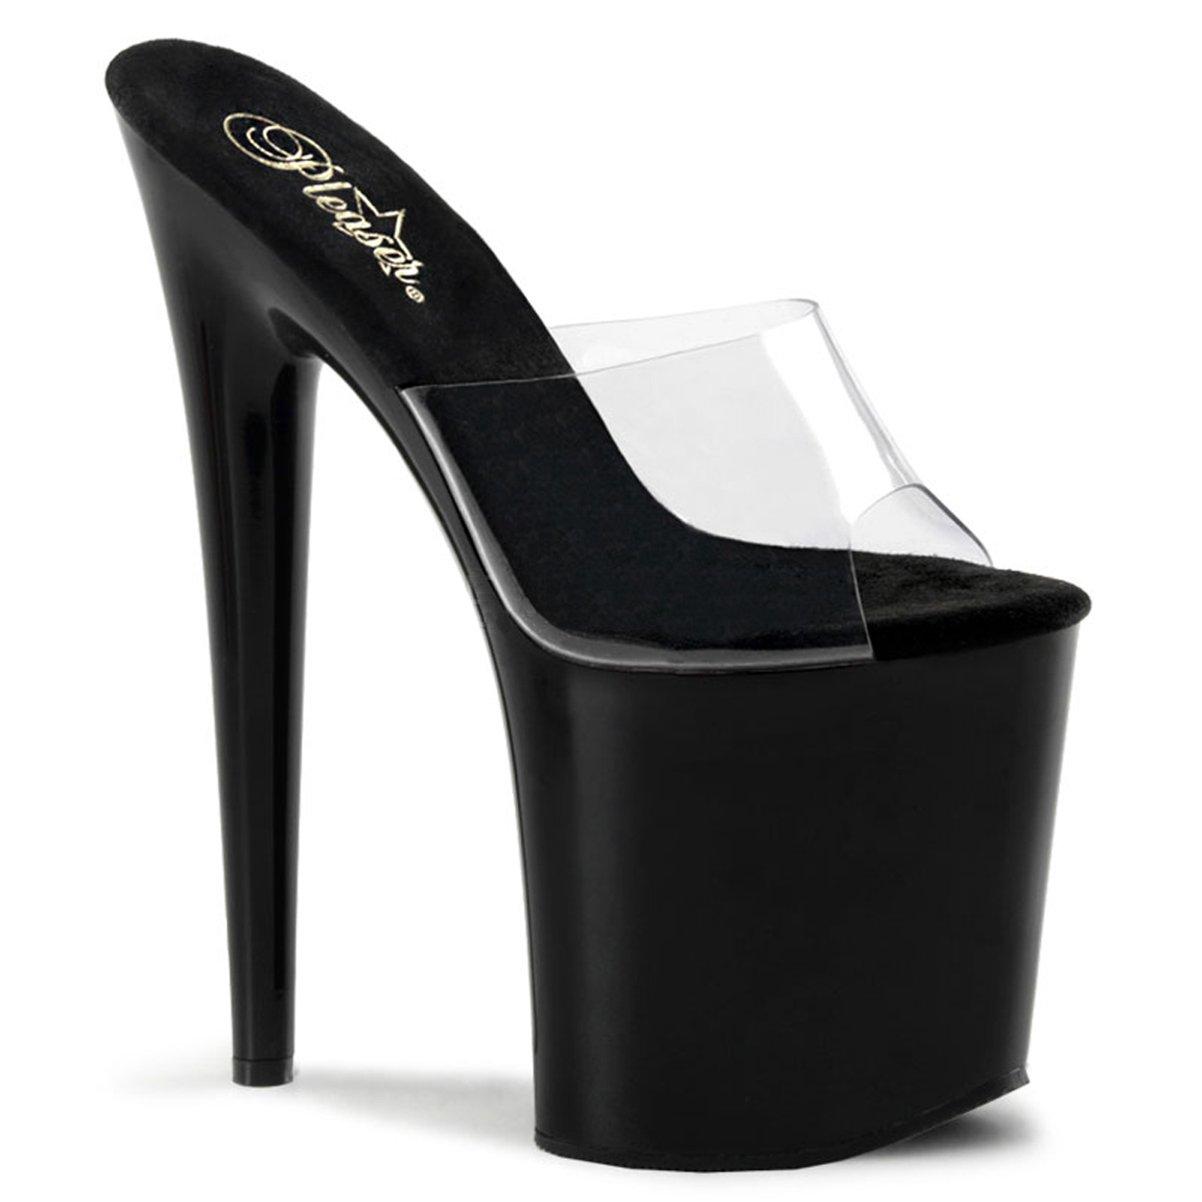 8 Inch Heel High Platform Sandal Shoe Slip On Sexy Stripper Shoes Open Toe B002XEWC7A 5 B(M) US|Black/Clear